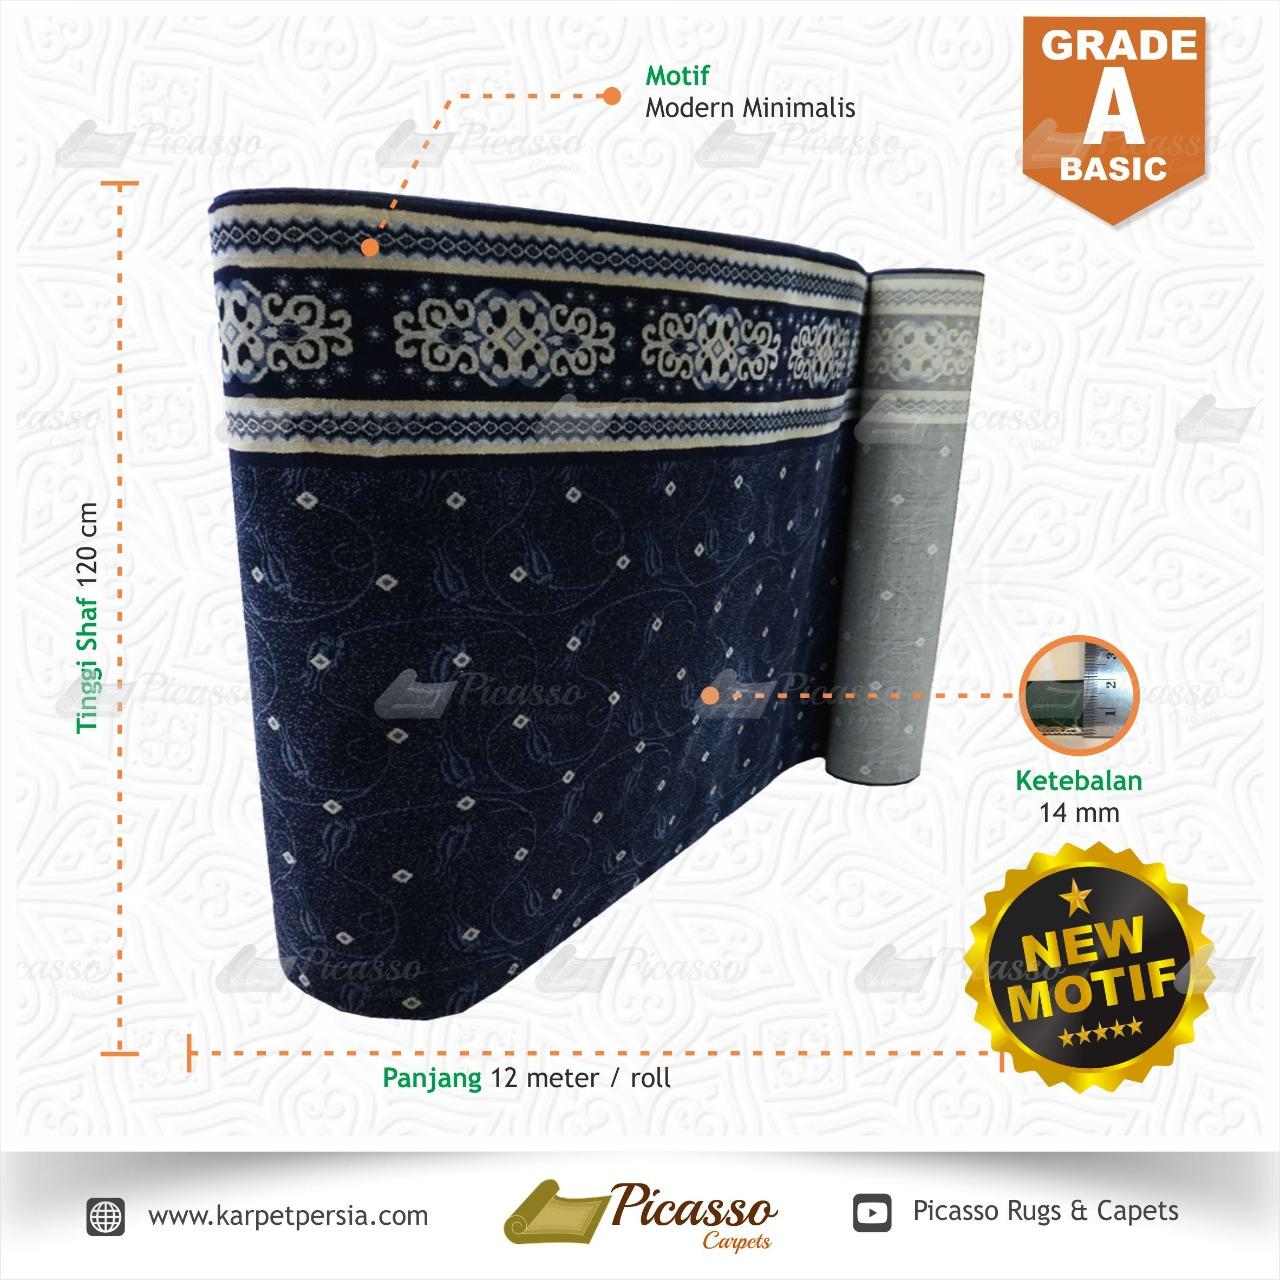 karpet masjid - Grade A Basic